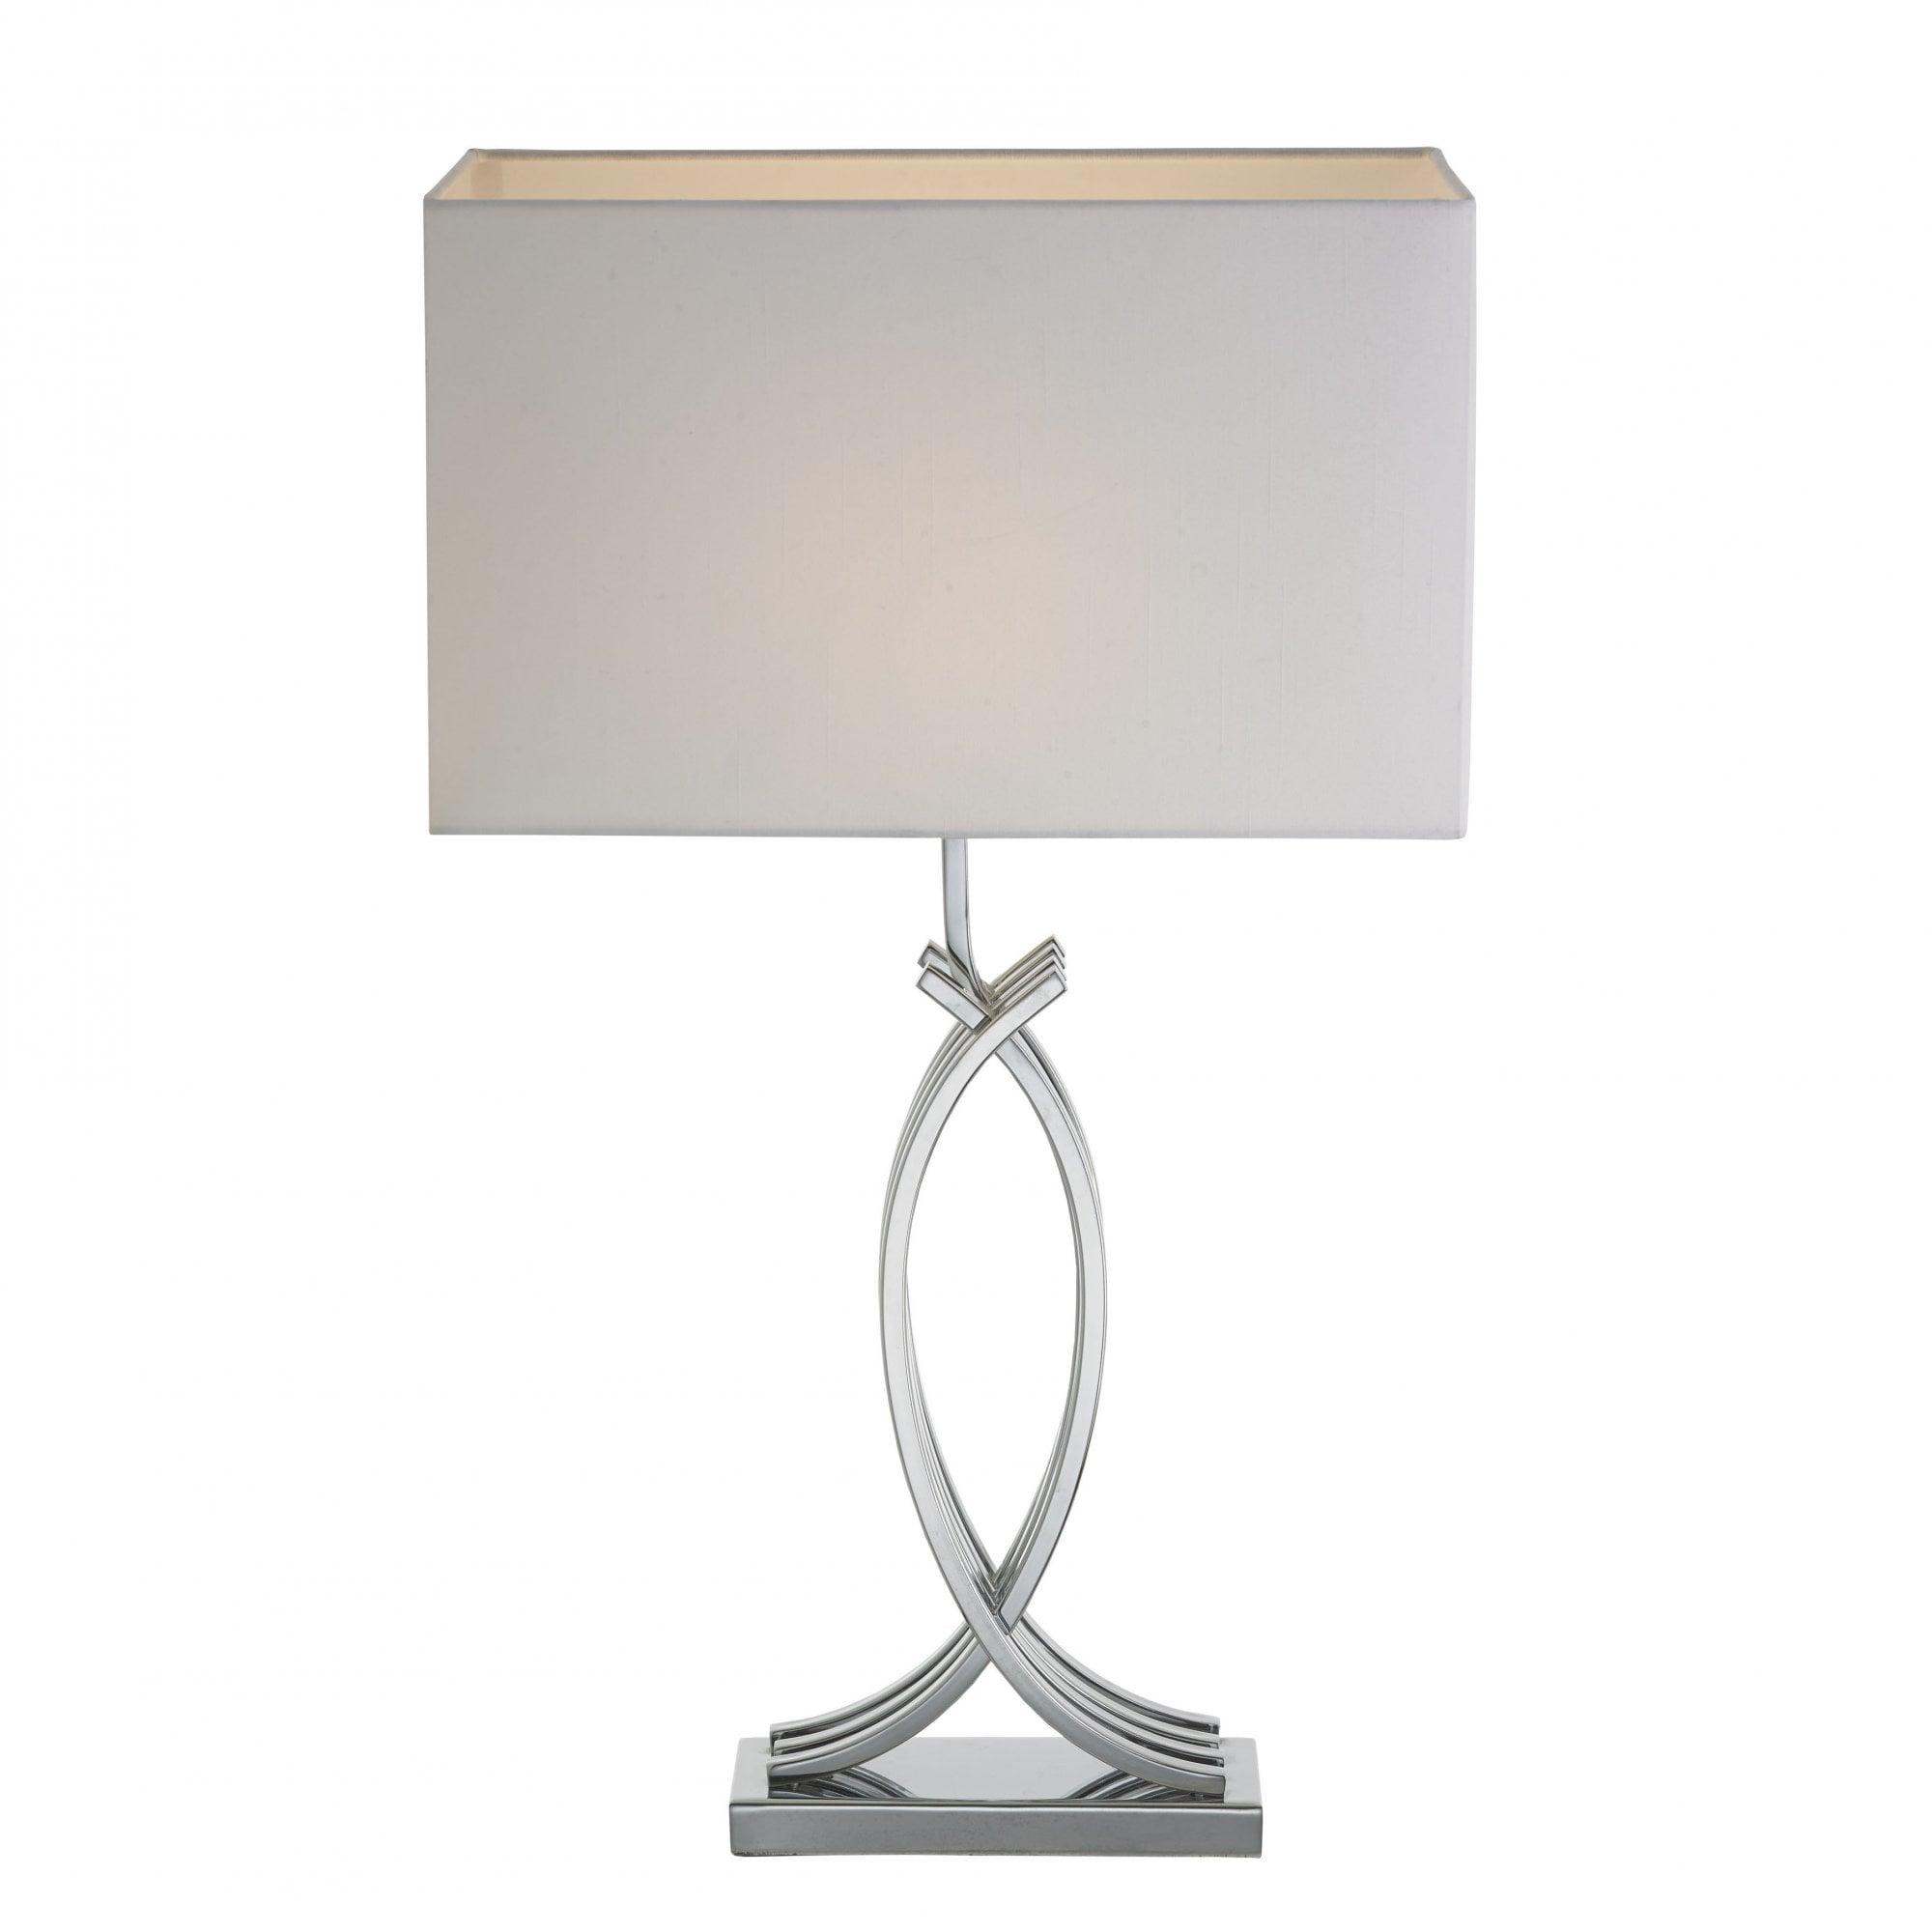 RV Astley Coco Chrome Lamp